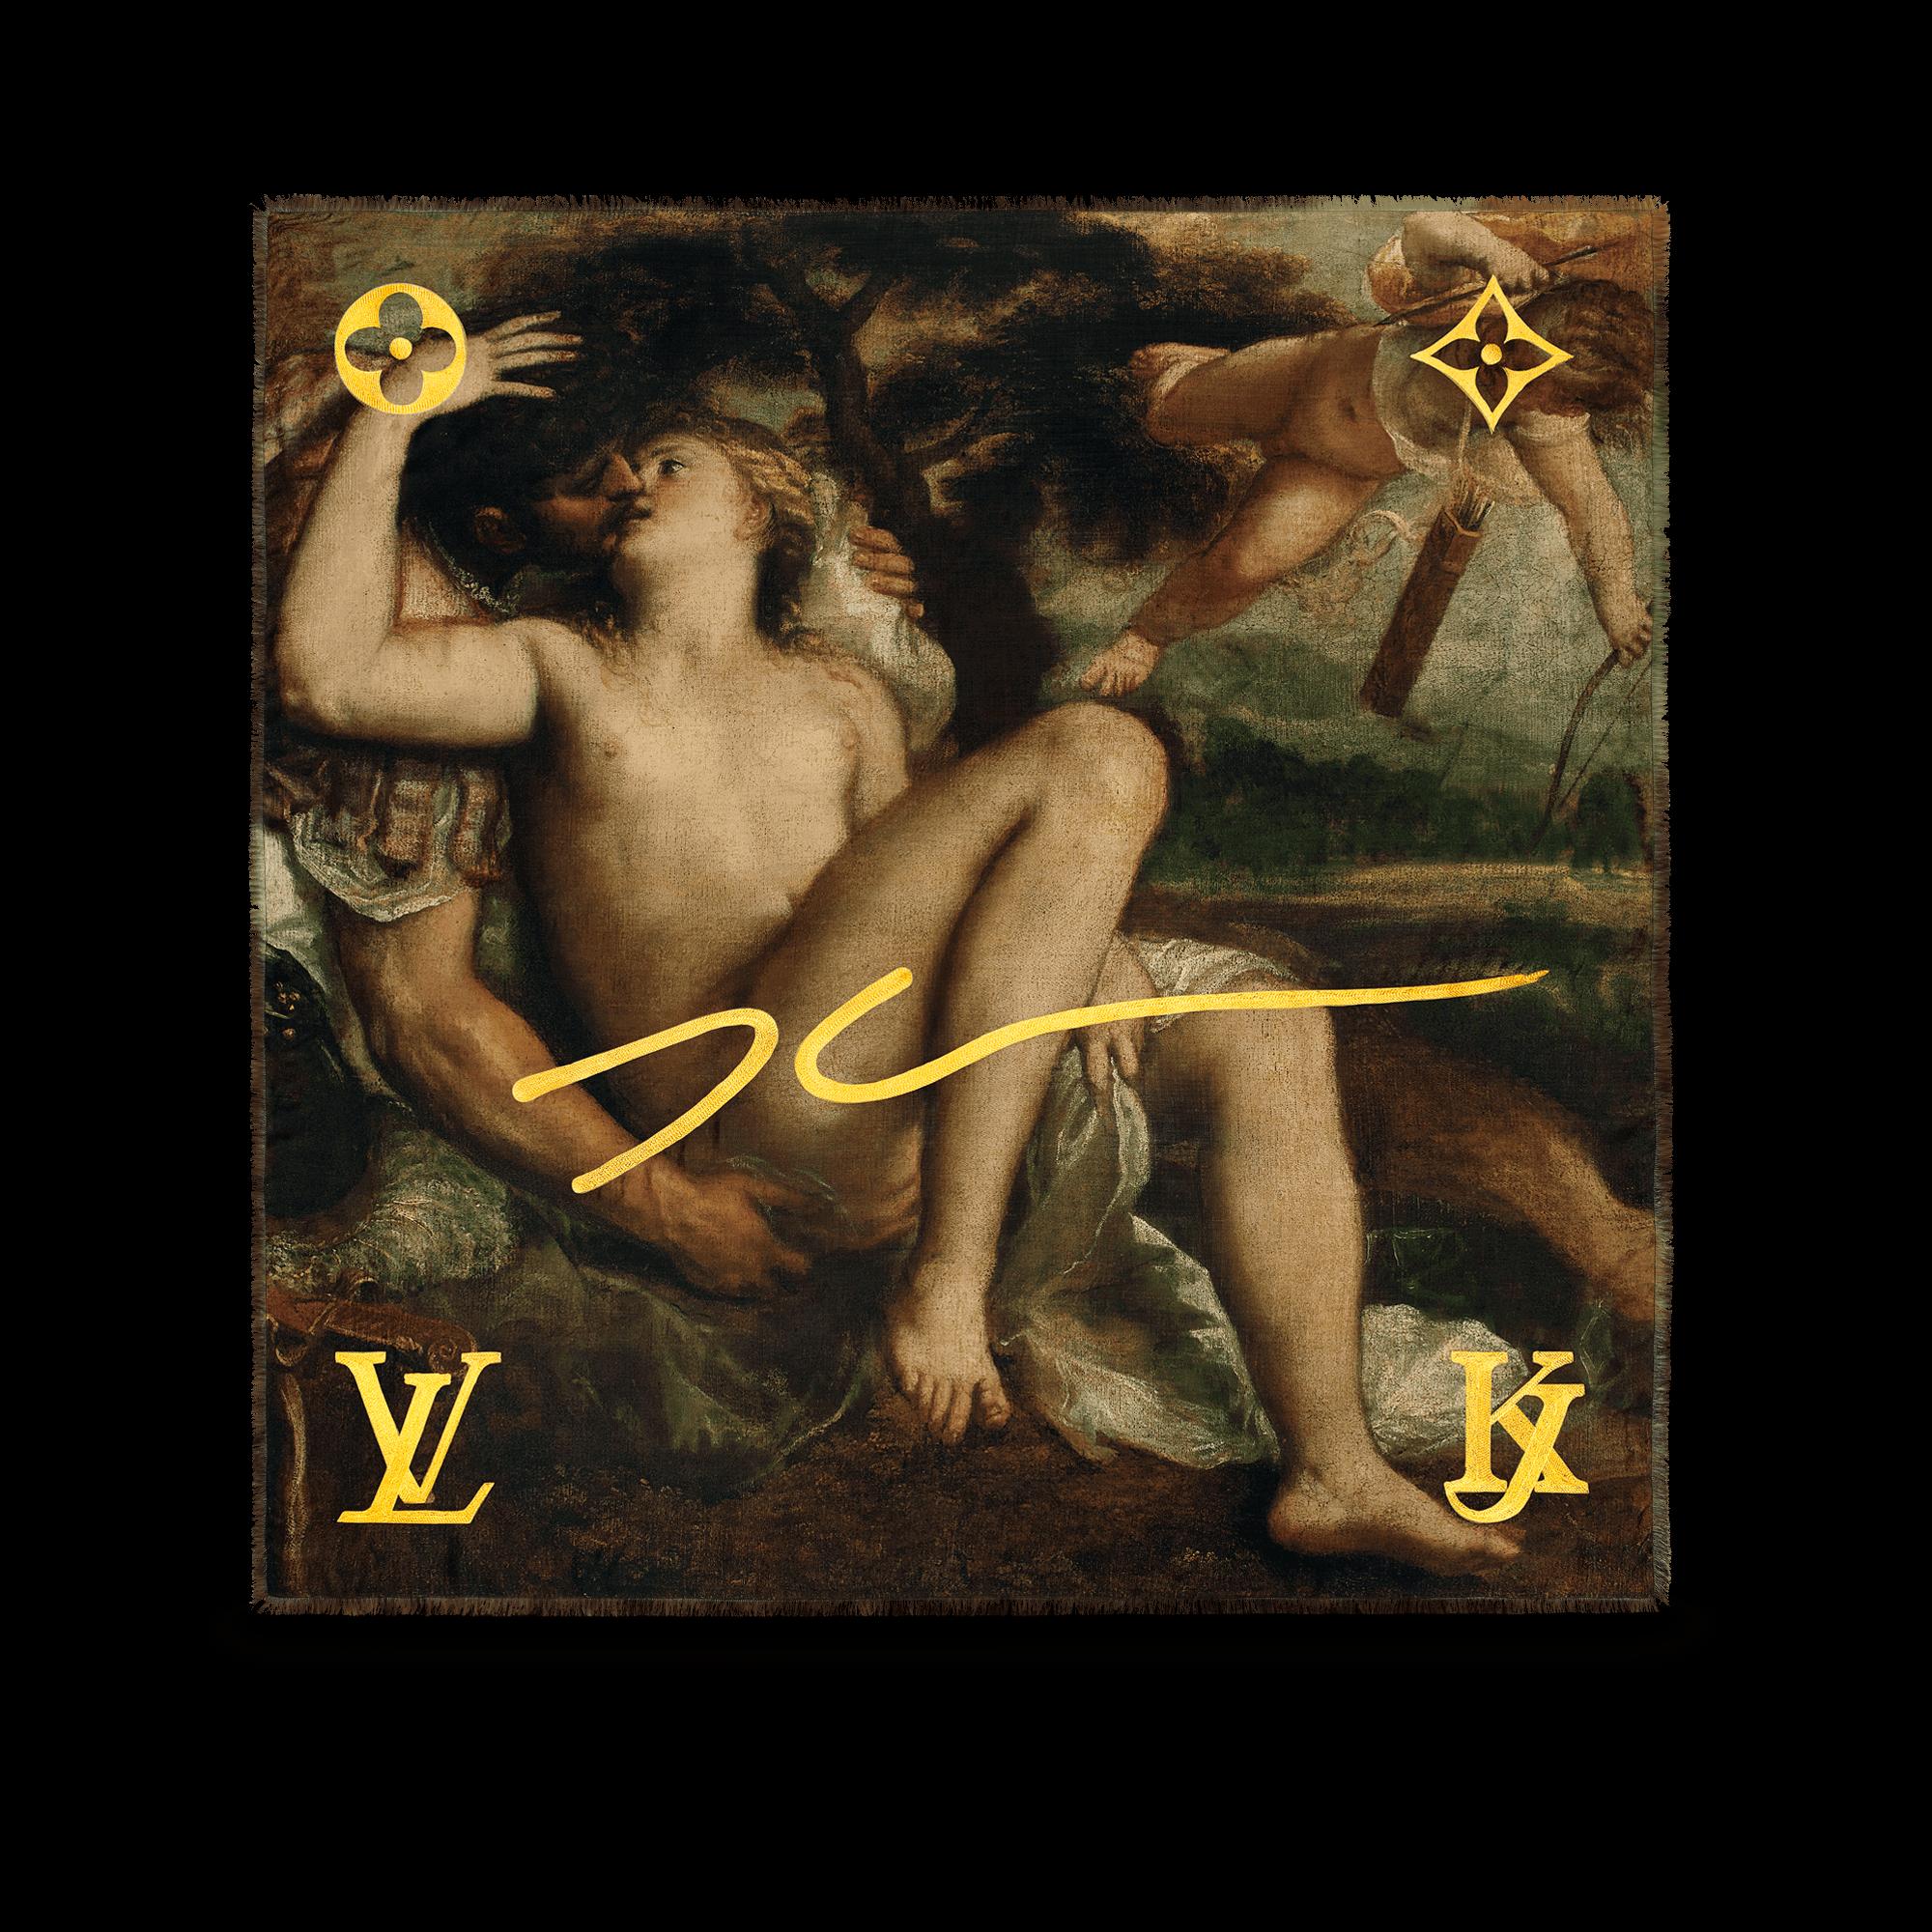 Louis Vuitton Jeff Koons Collaboration